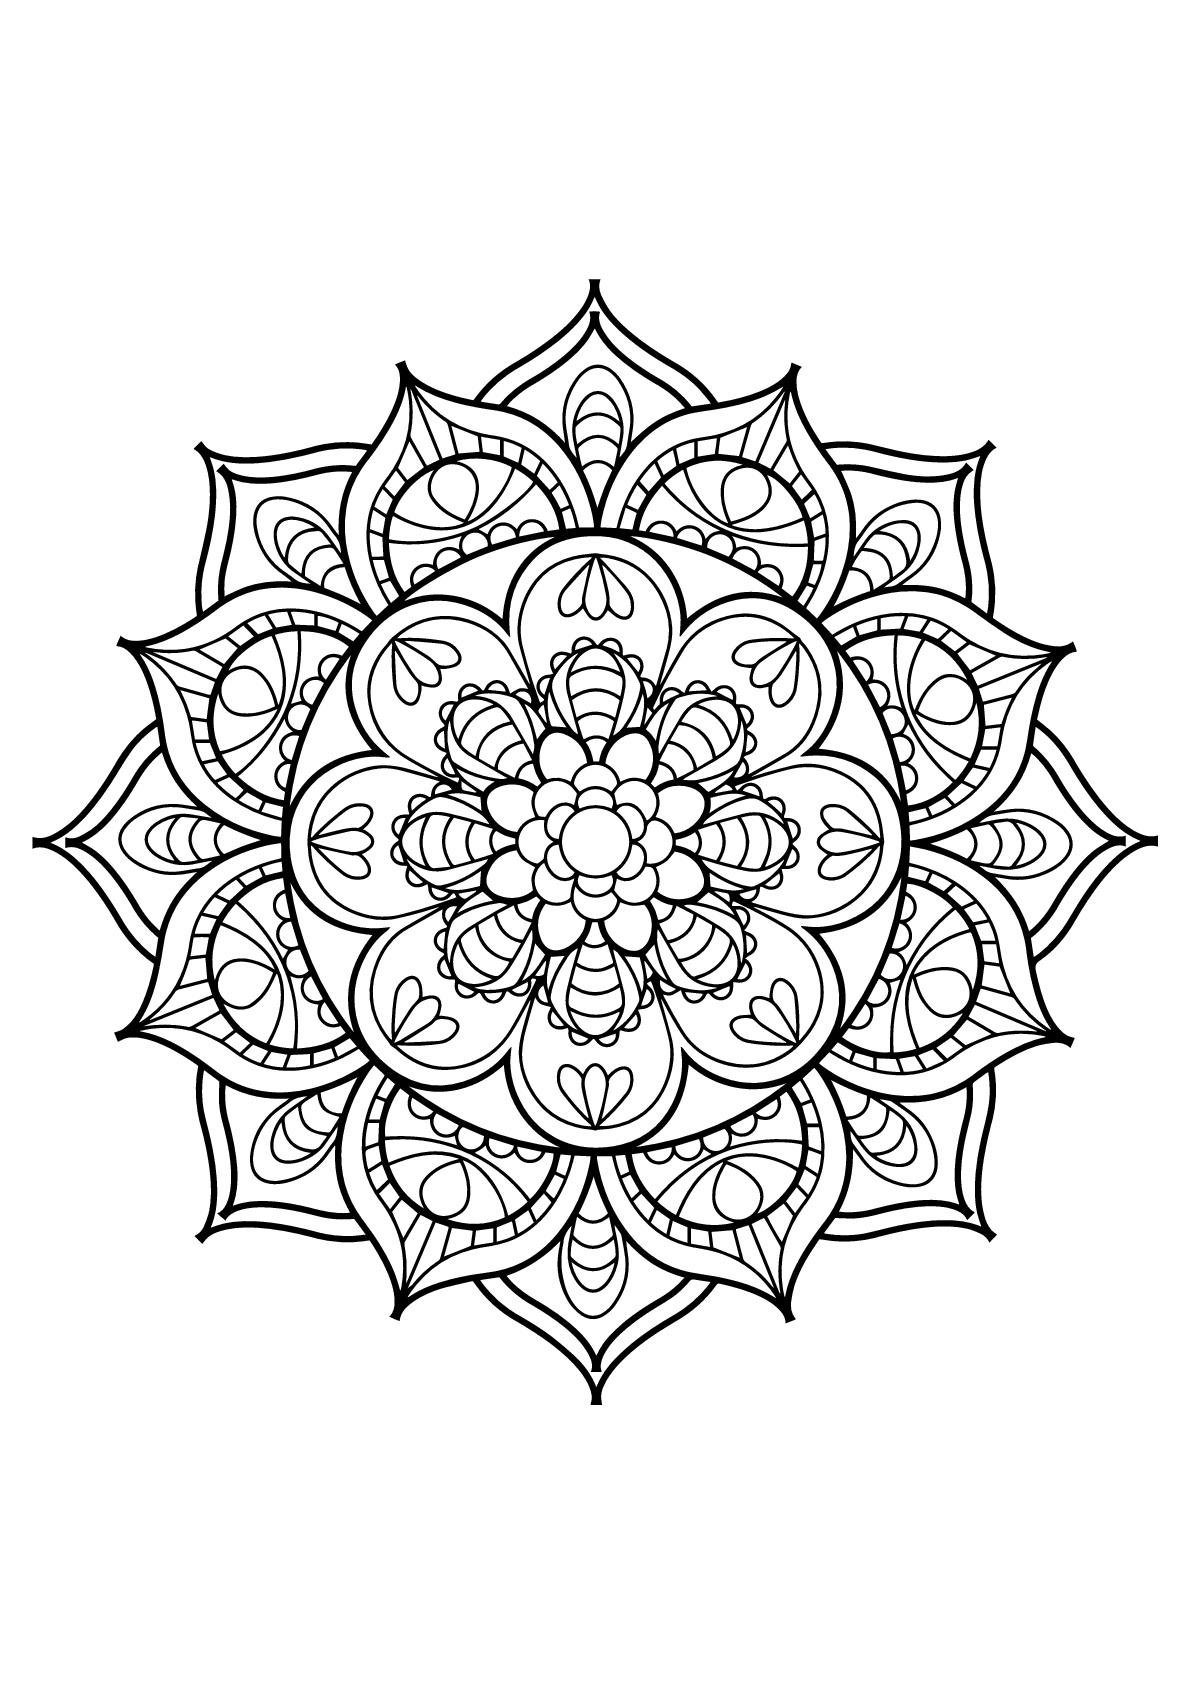 Mandala complexe livre gratuit 11 coloriage mandalas - Coloriage mandala enfants ...